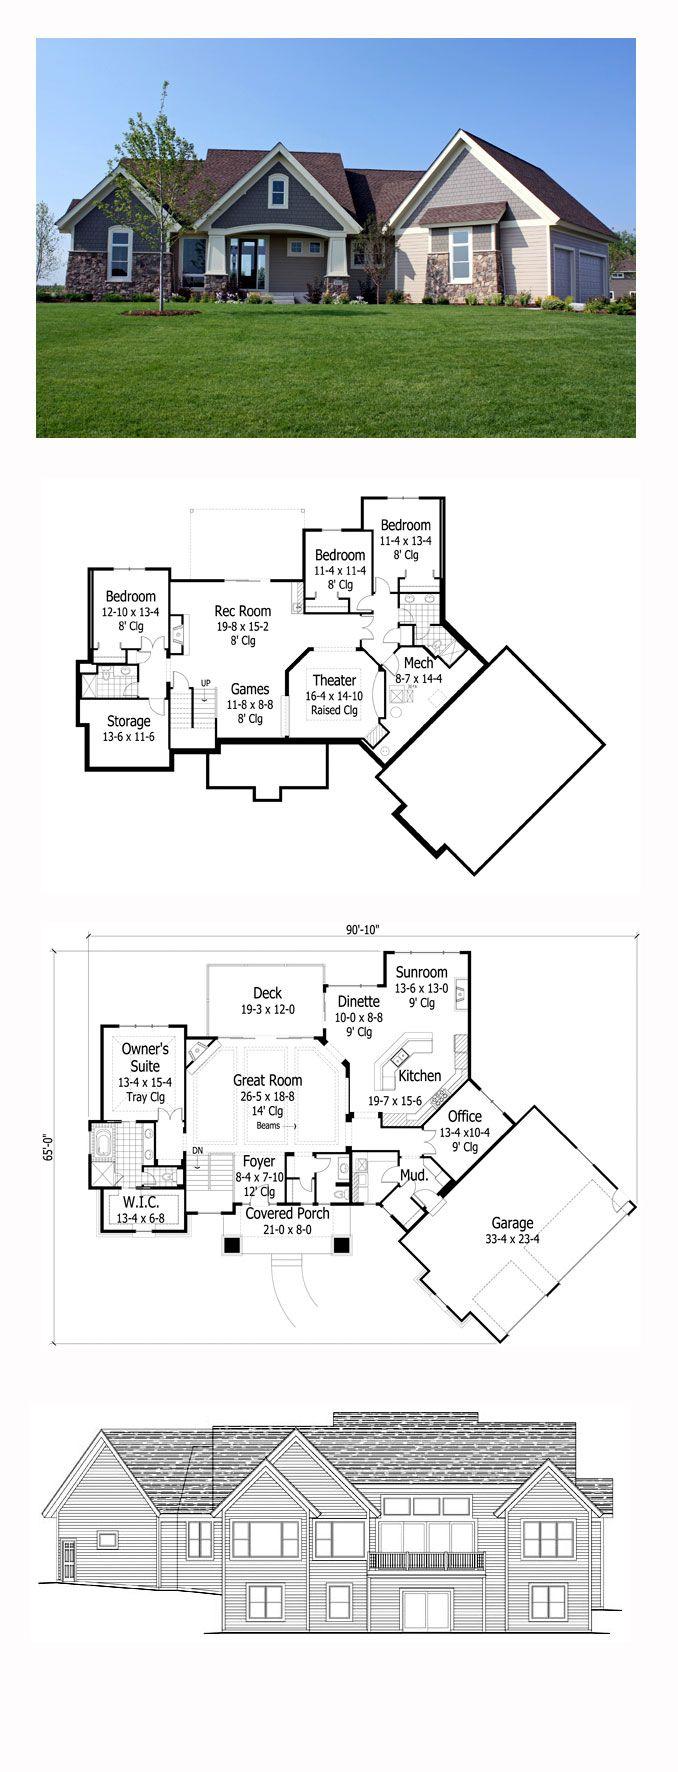 17 best bungalow house plans images on pinterest cool house bungalow style cool house plan id chp 47094 total living area 3997